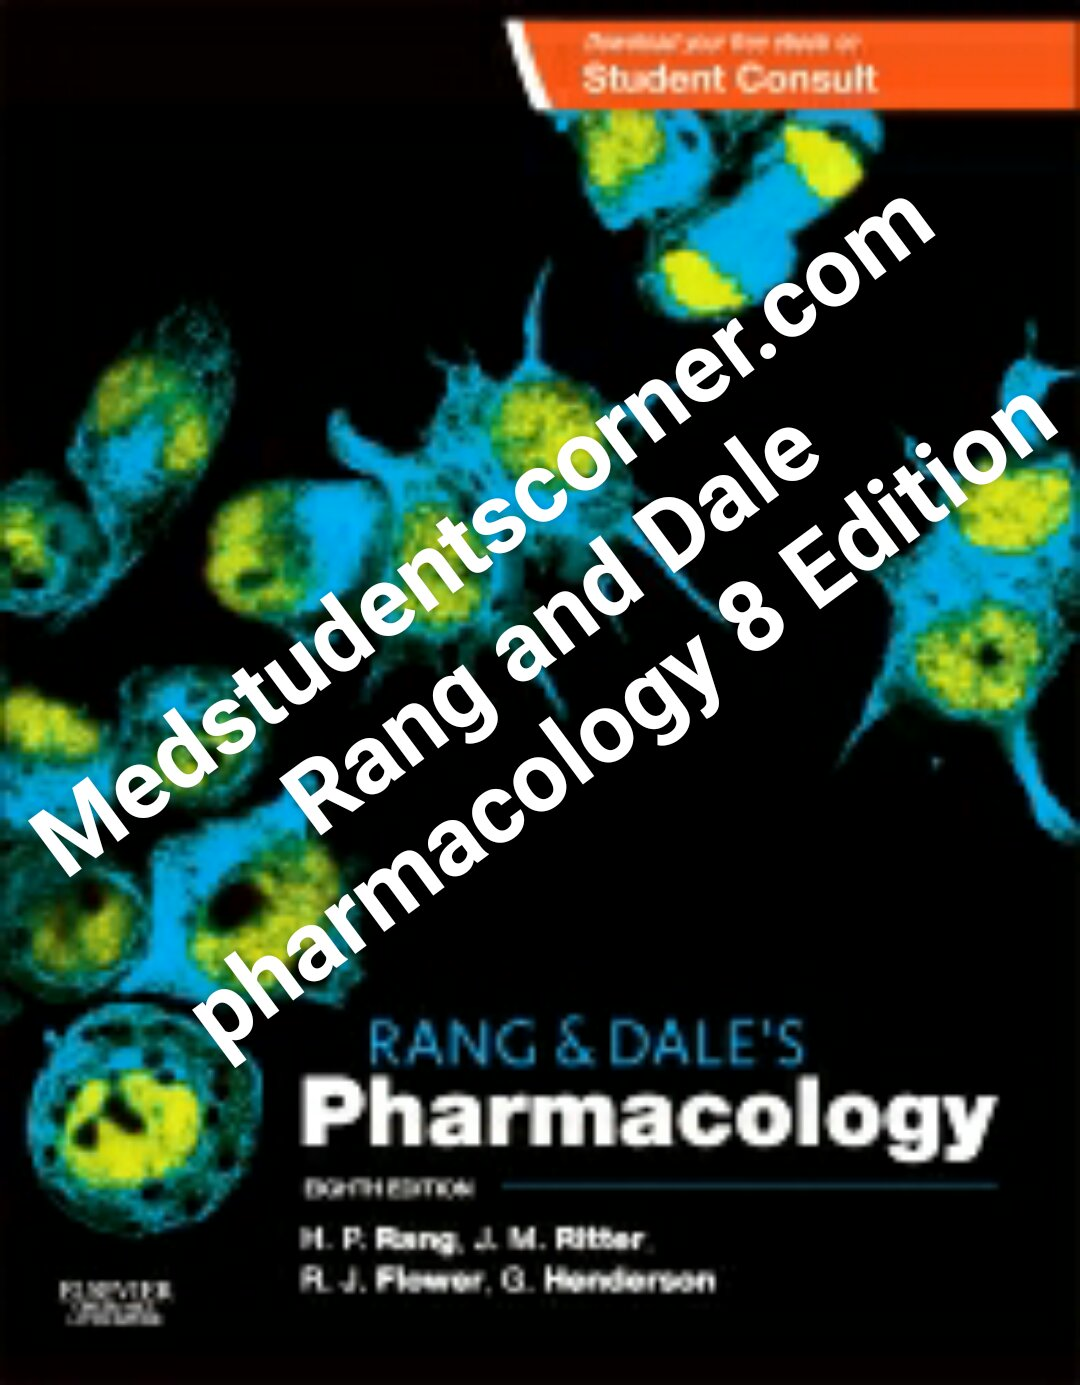 Rang and Dale pharmacology pdf